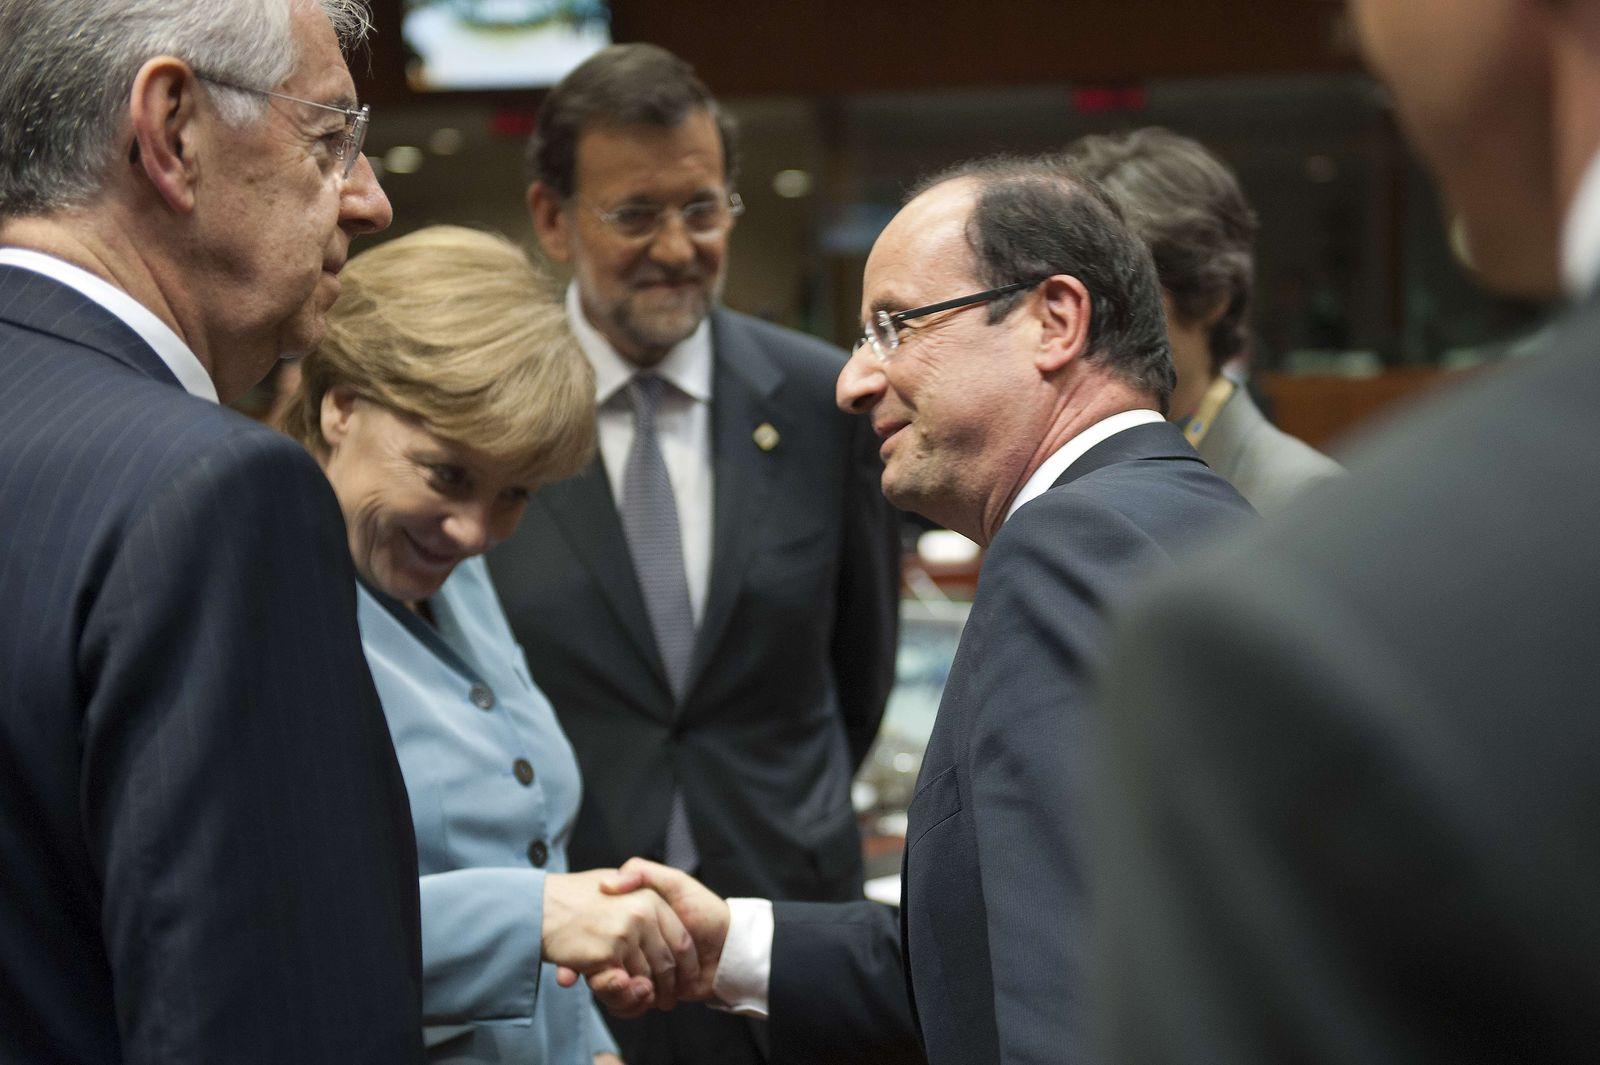 BELGIUM-EU-SUMMIT-FINANCE-PUBLIC-DEBT Monti Rajoy Hollande Merkel